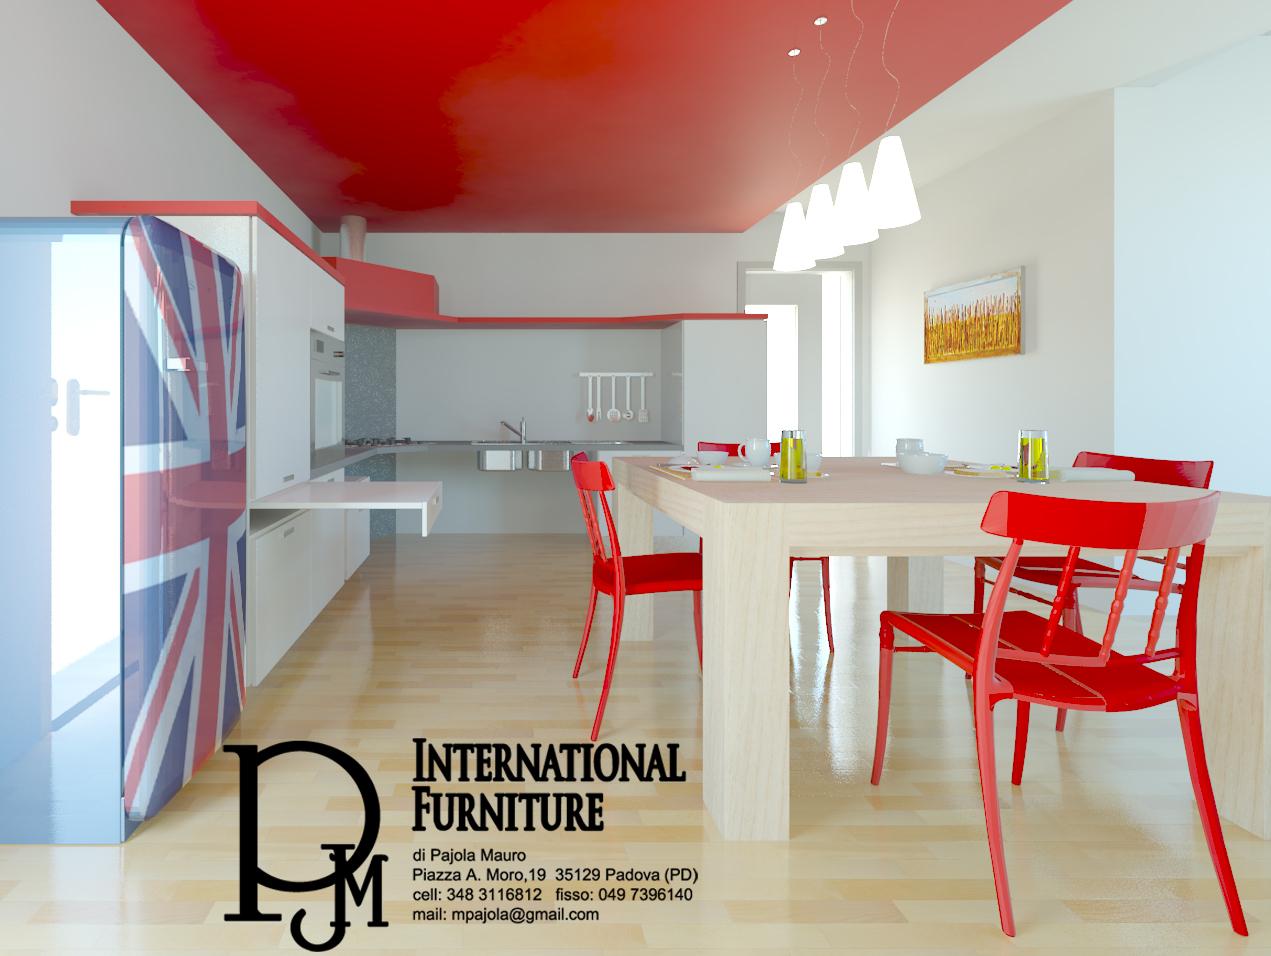 Cucine per disabili a Padova - Arredamento Disabile | Cucina